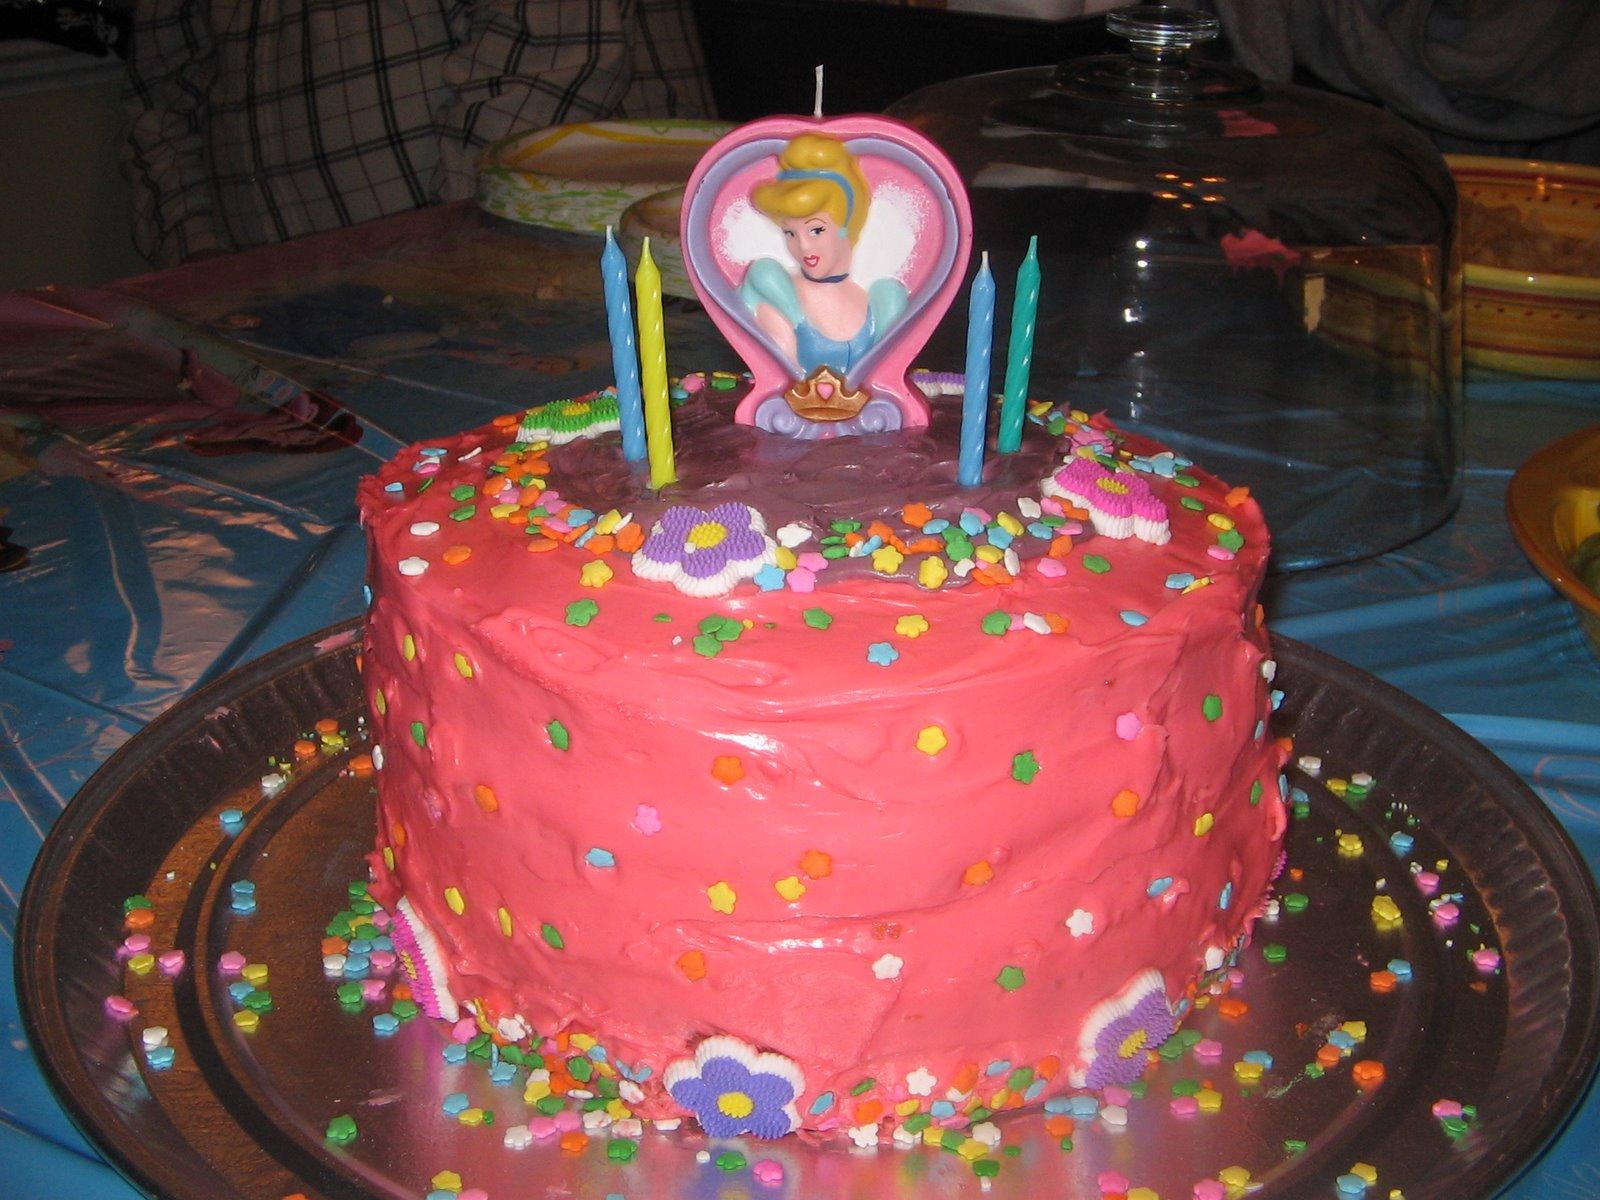 Homemade Birthday Cakes For Boyfriend Homemade baby food (lol too